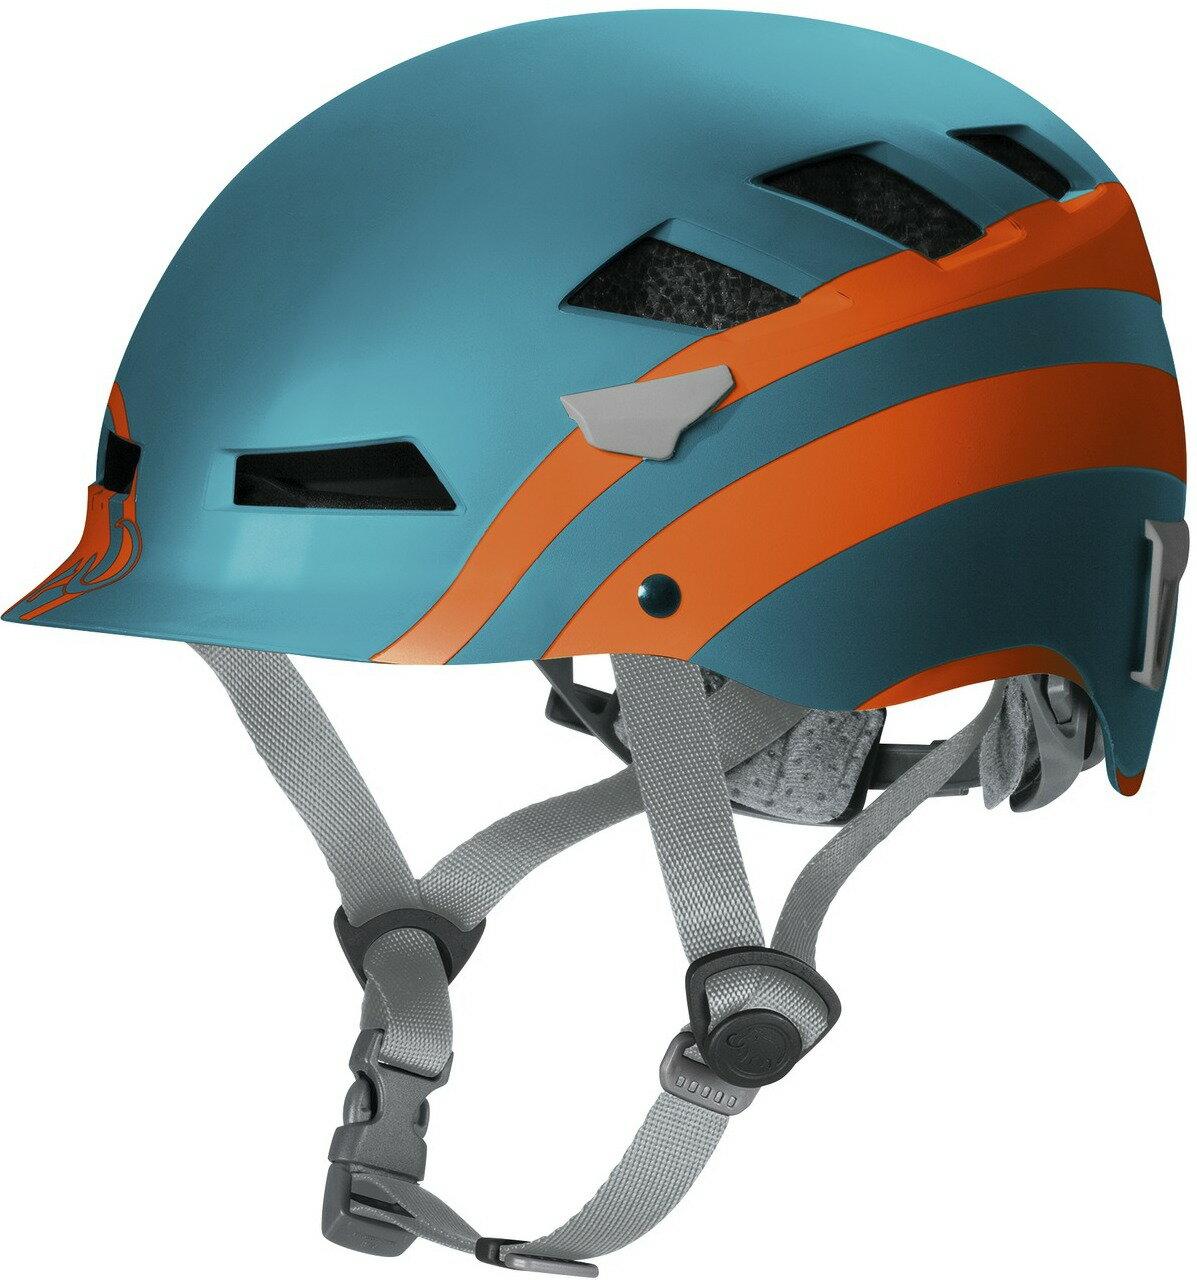 Mammut 長毛象 頭盔/岩盔 El Cap Helmet 2220-00090 5717太平洋藍 瑞士長毛象/台北山水